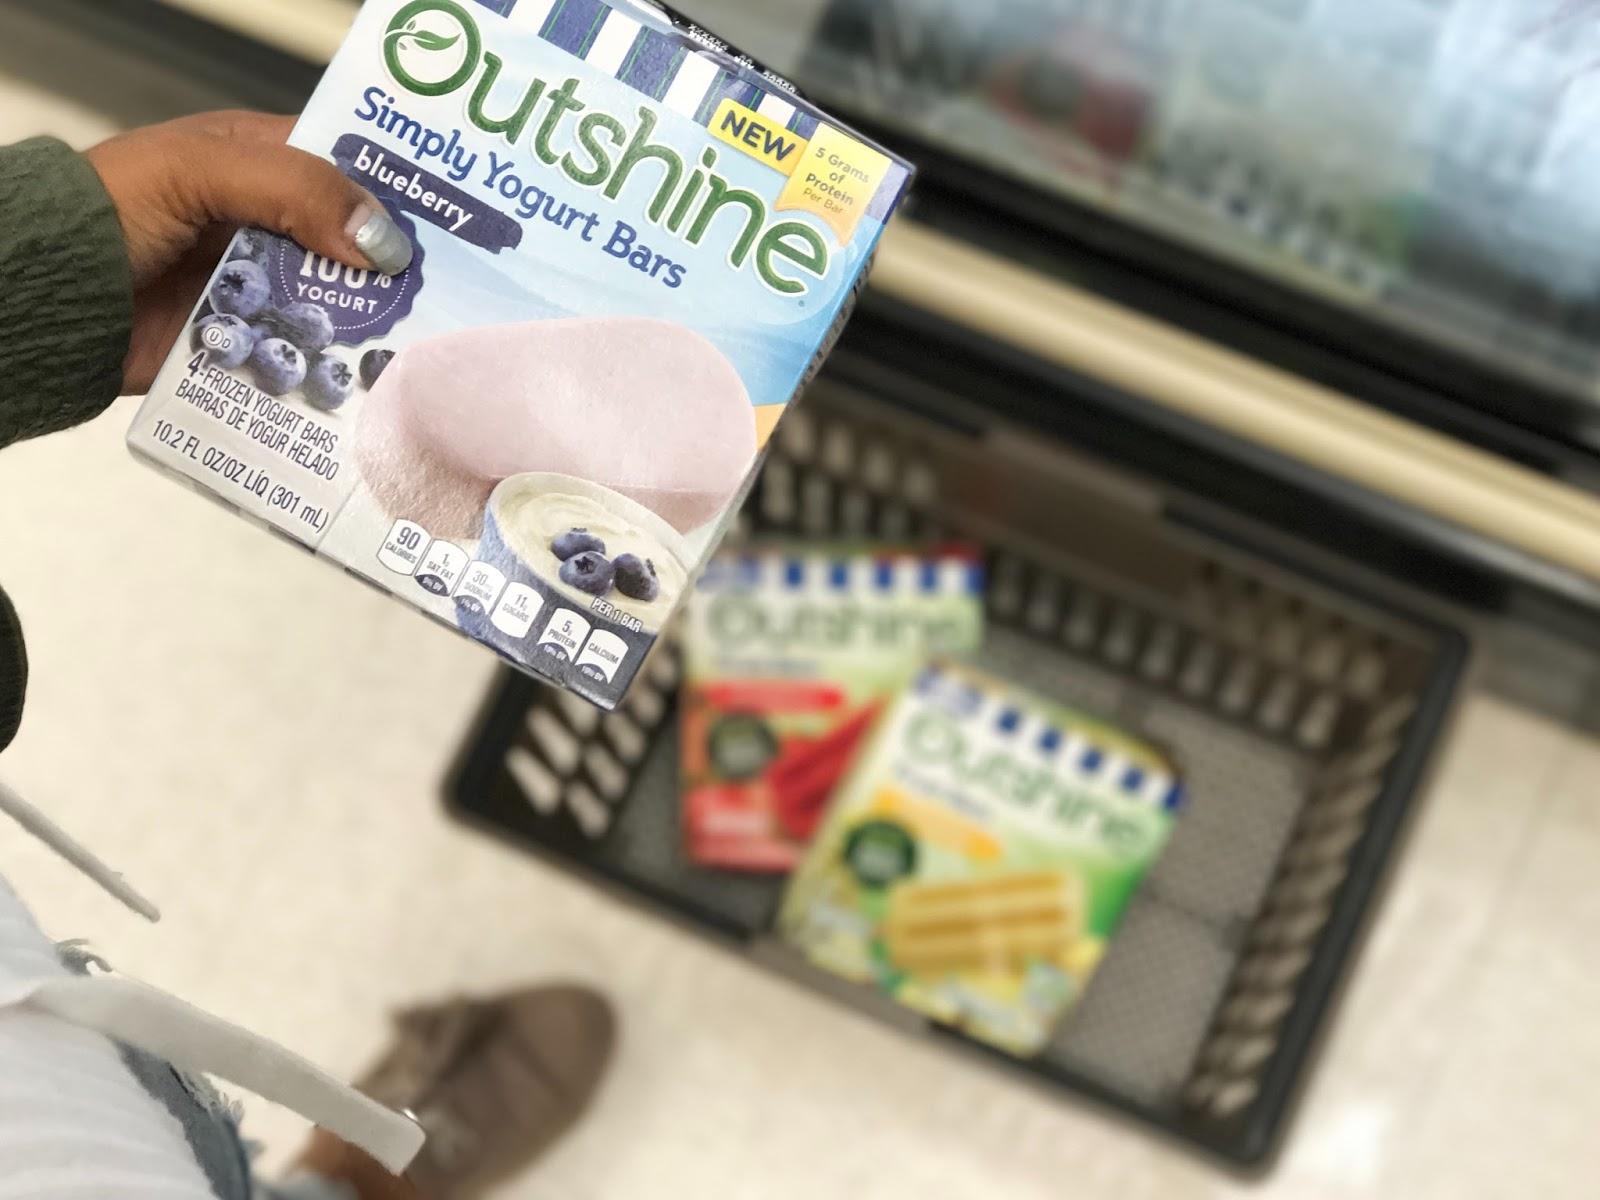 Outshine, snacks, ice cream yogurt, healthy snack ideas, healthy frozen snacks Outshine at Giant, blueberry